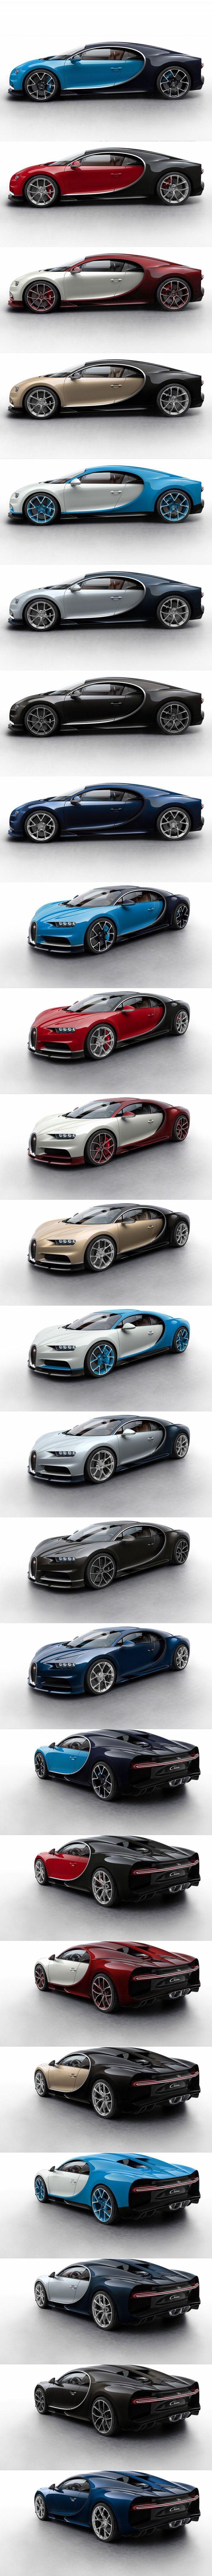 93472c8b10e06b63ea6f876b56968686--summer-days-bugatti-chiron Fascinating Gran Turismo Psp Bugatti Veyron Price Cars Trend